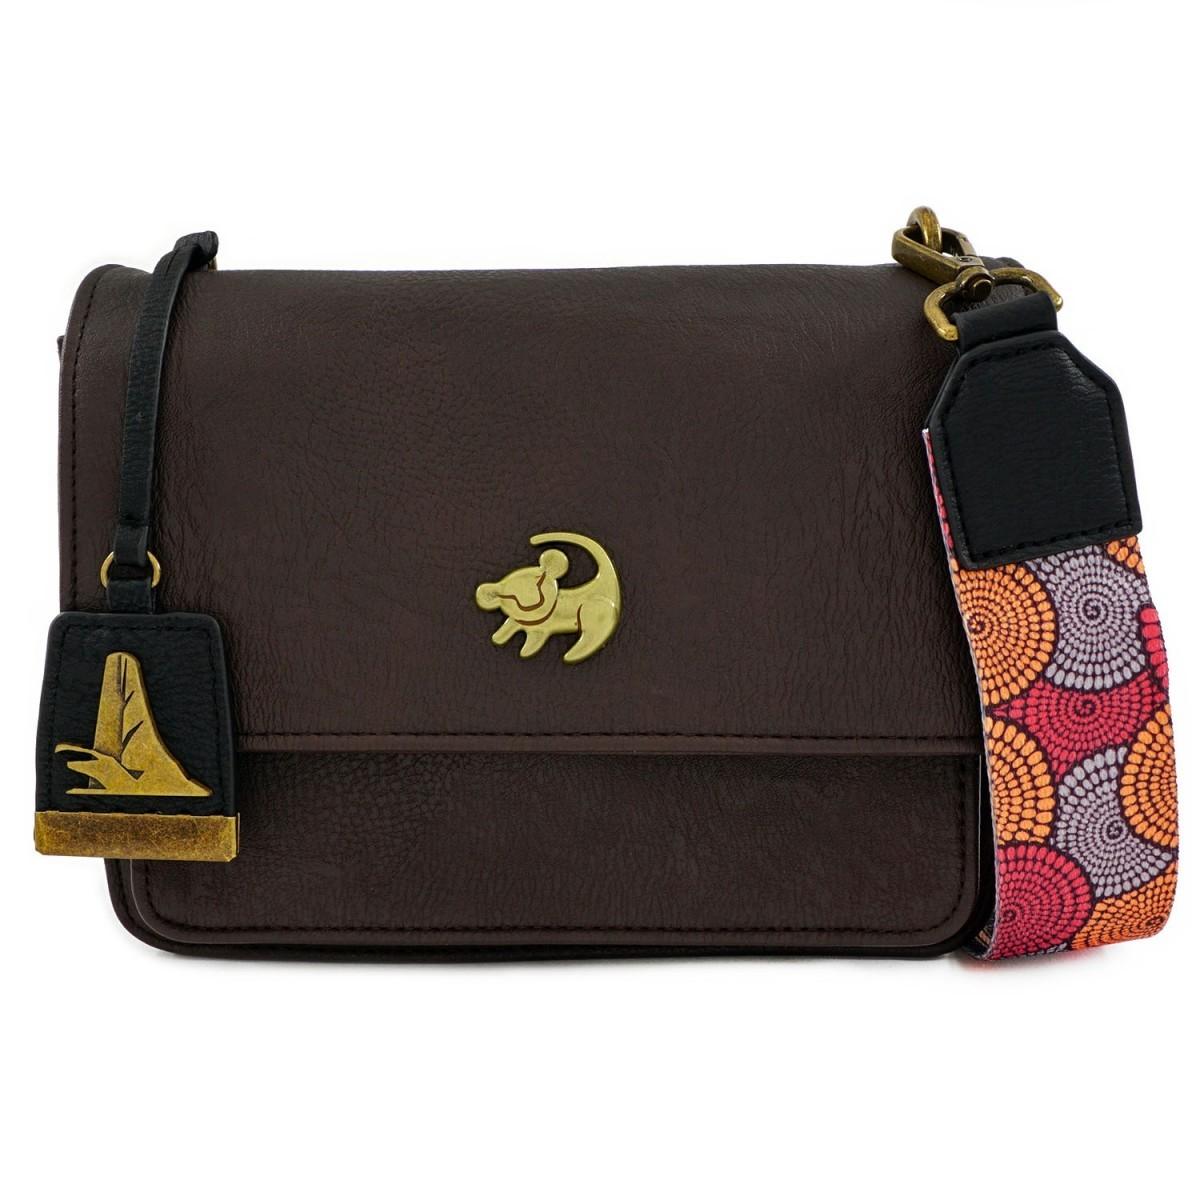 Loungefly: Lion King - Simba Painting Crossbody Bag image